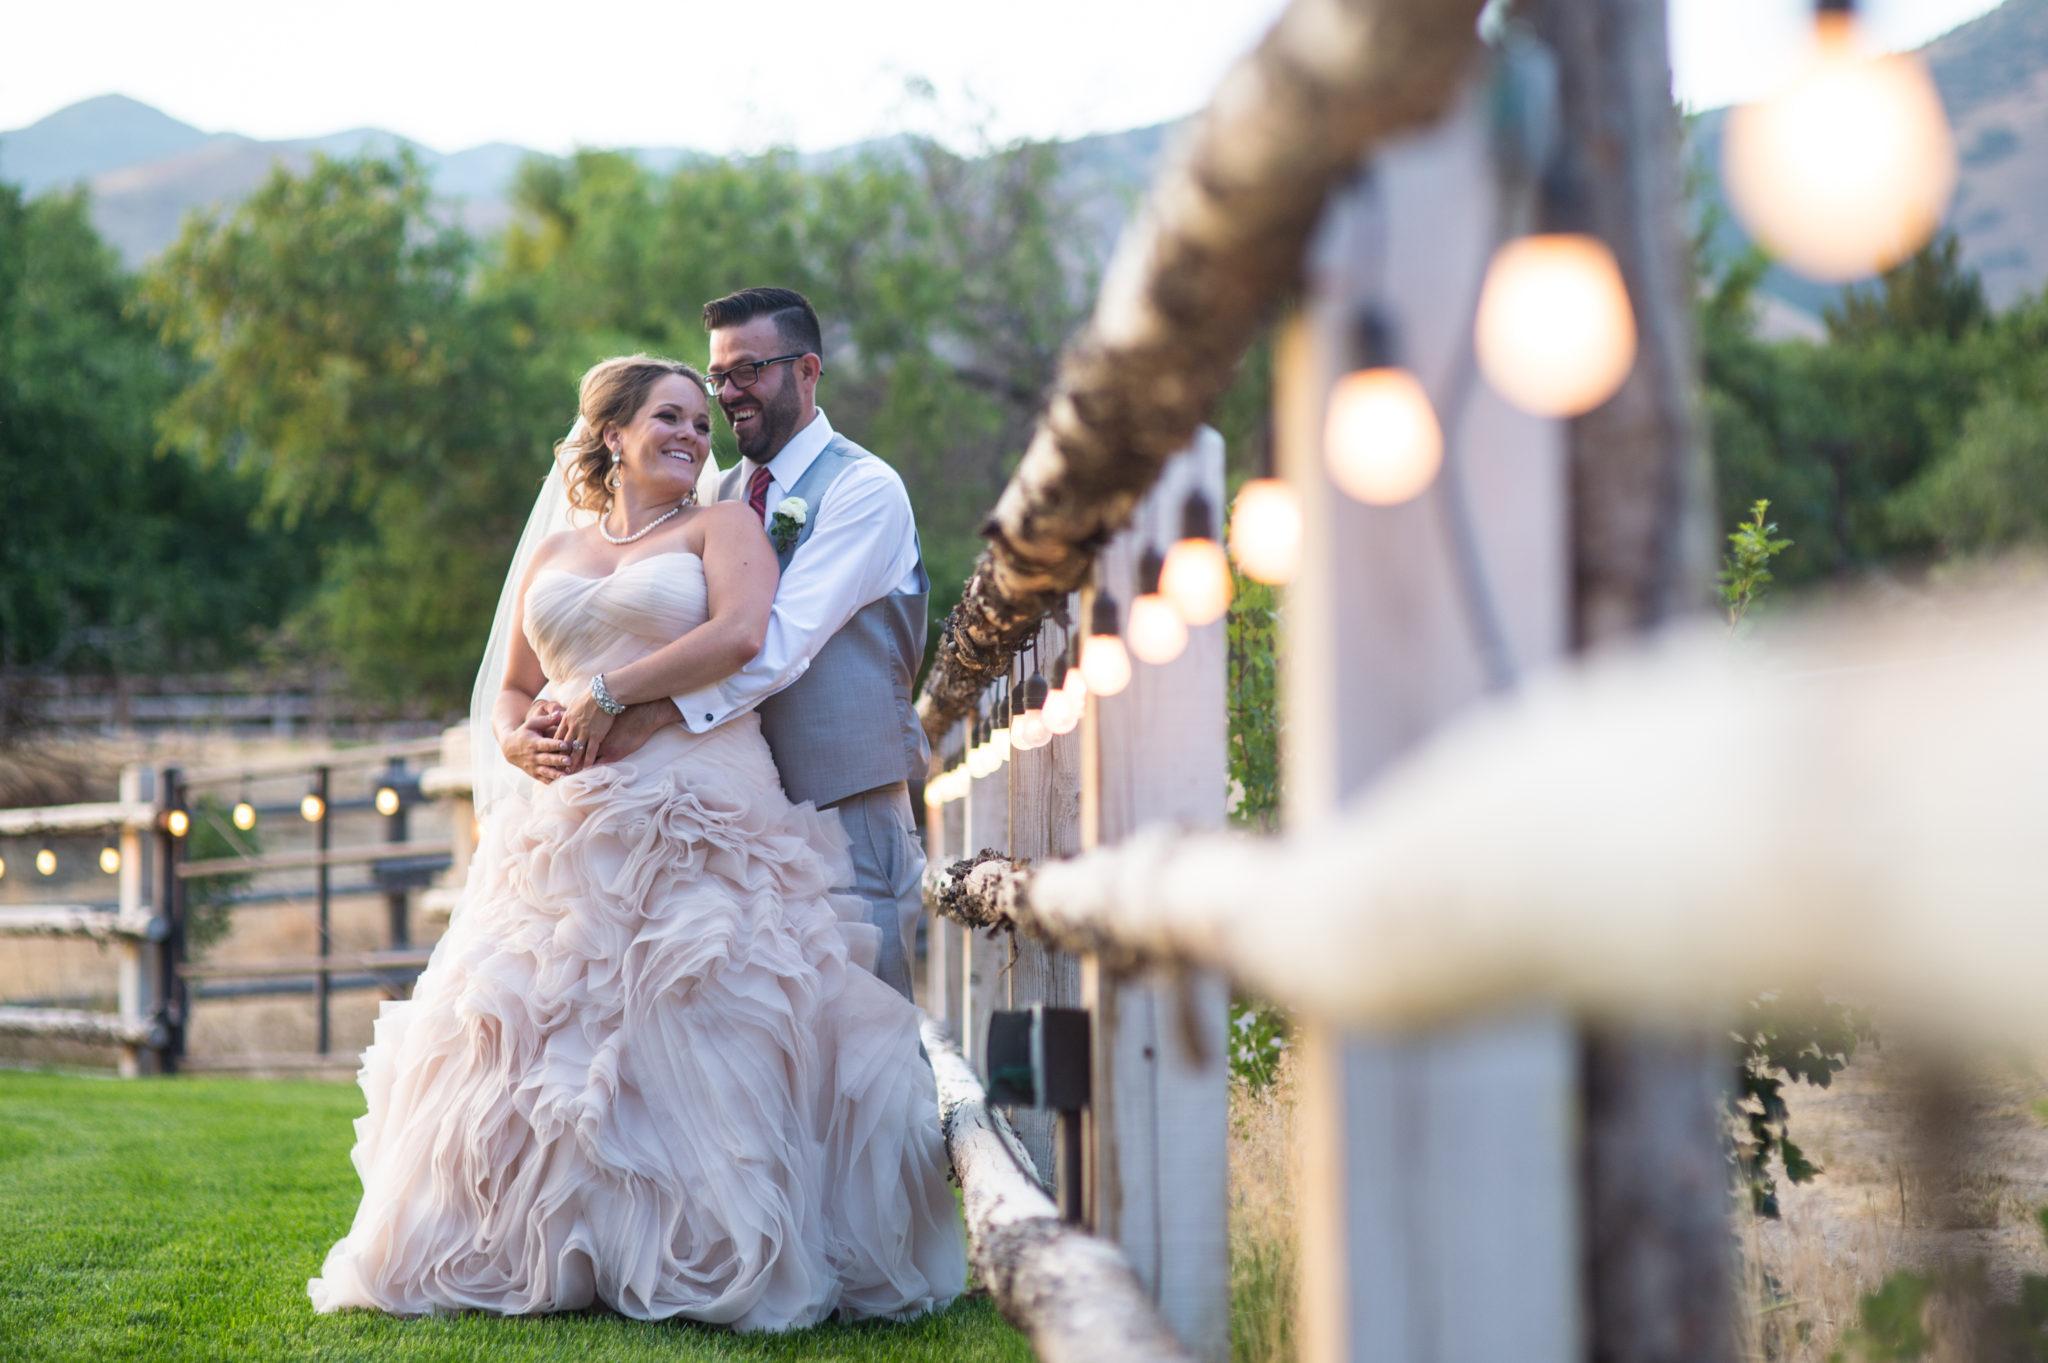 wedding photography utah springville backyard weddings best photography